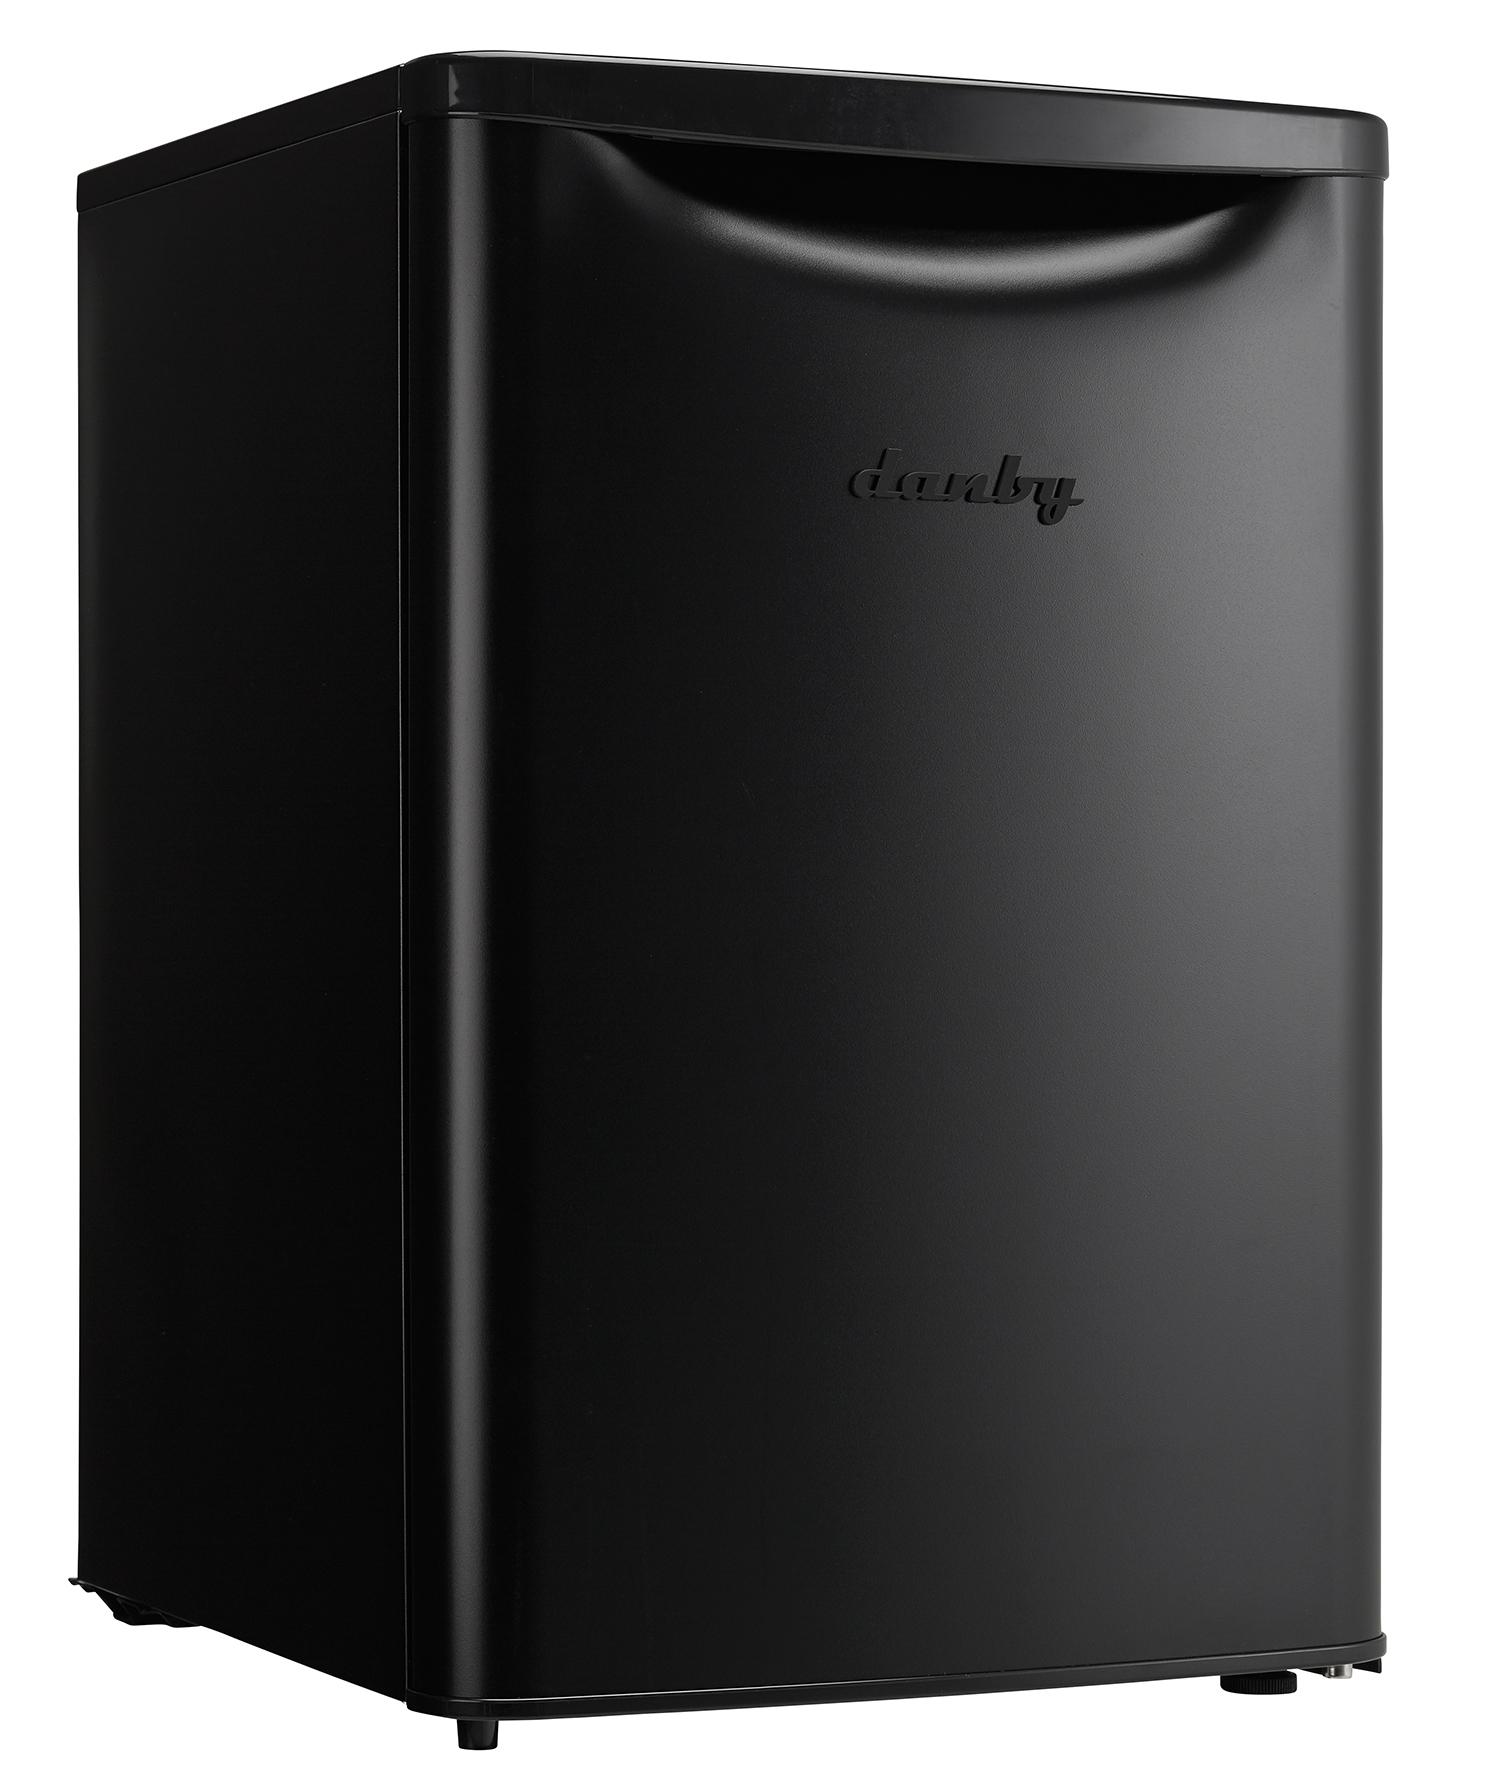 Danby Countertop Ice Maker Manual : DAR026A2BDB Danby 2.6 Cu.ft. Compact Refrigerator EN